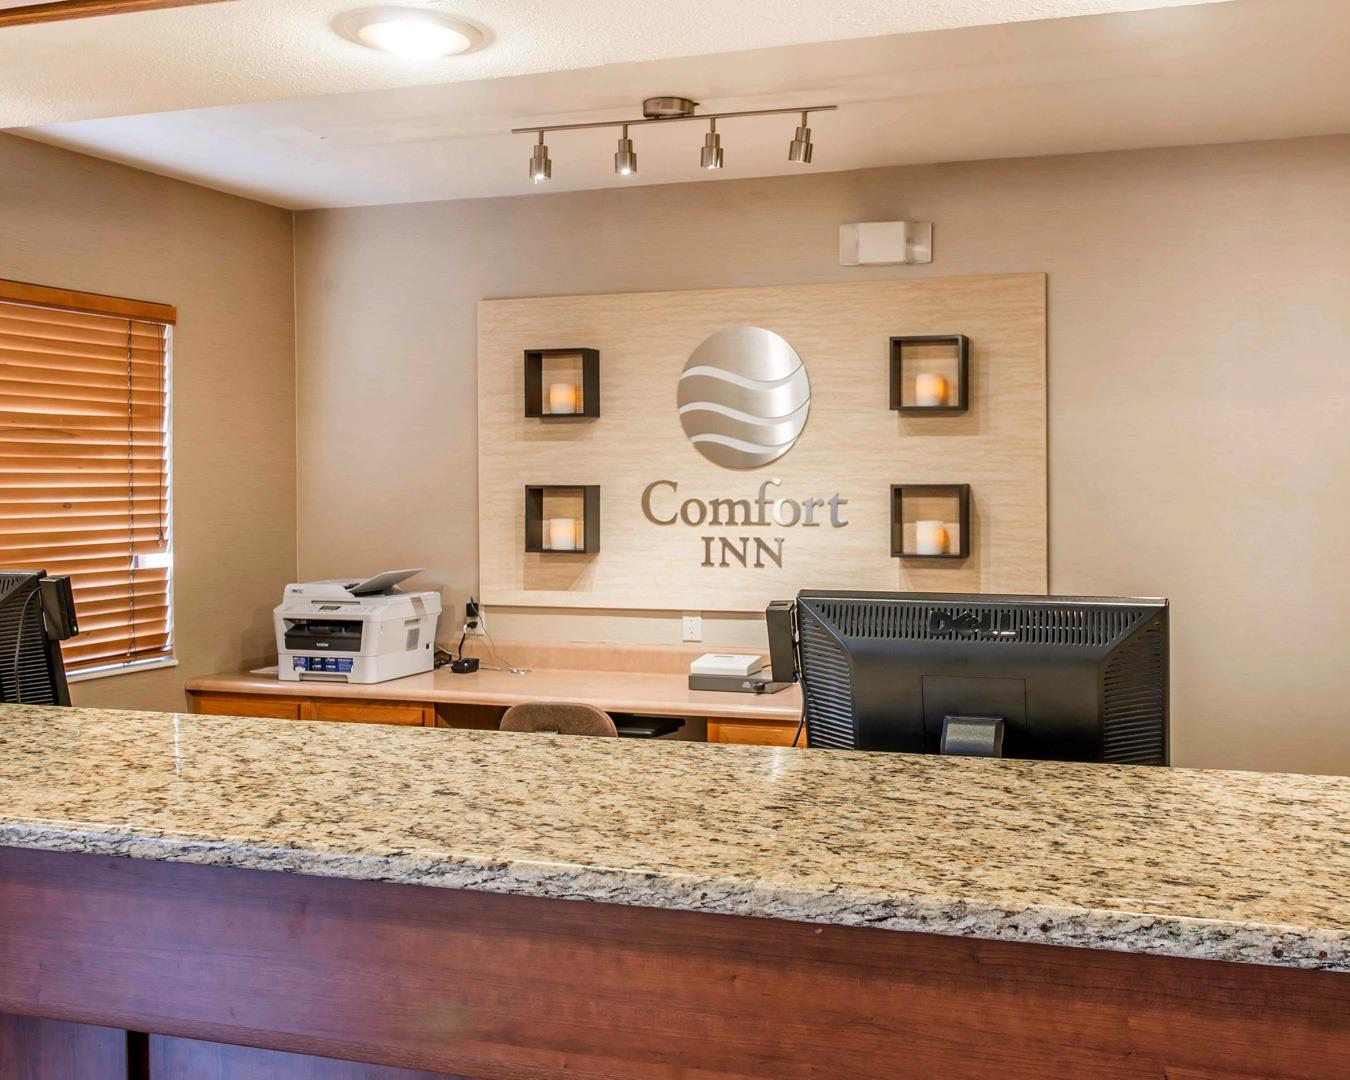 Comfort Inn, Salida CO